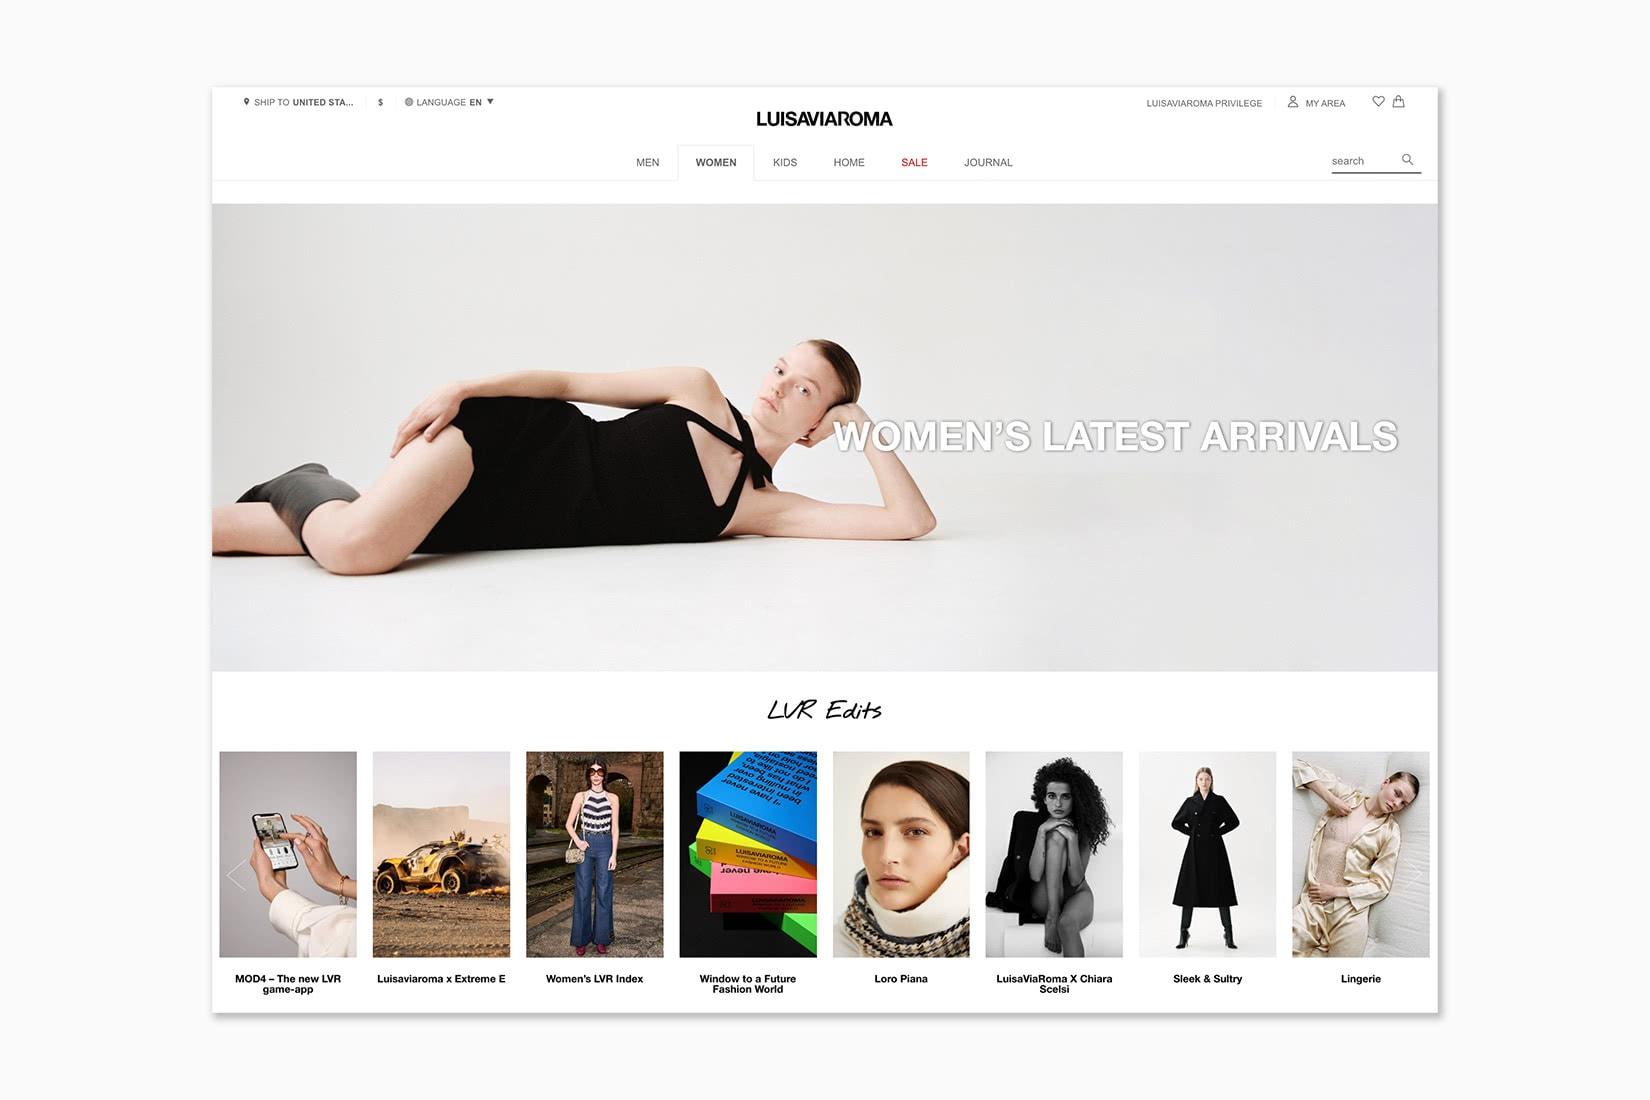 best online shopping sites women luisaviaroma - Luxe Digital